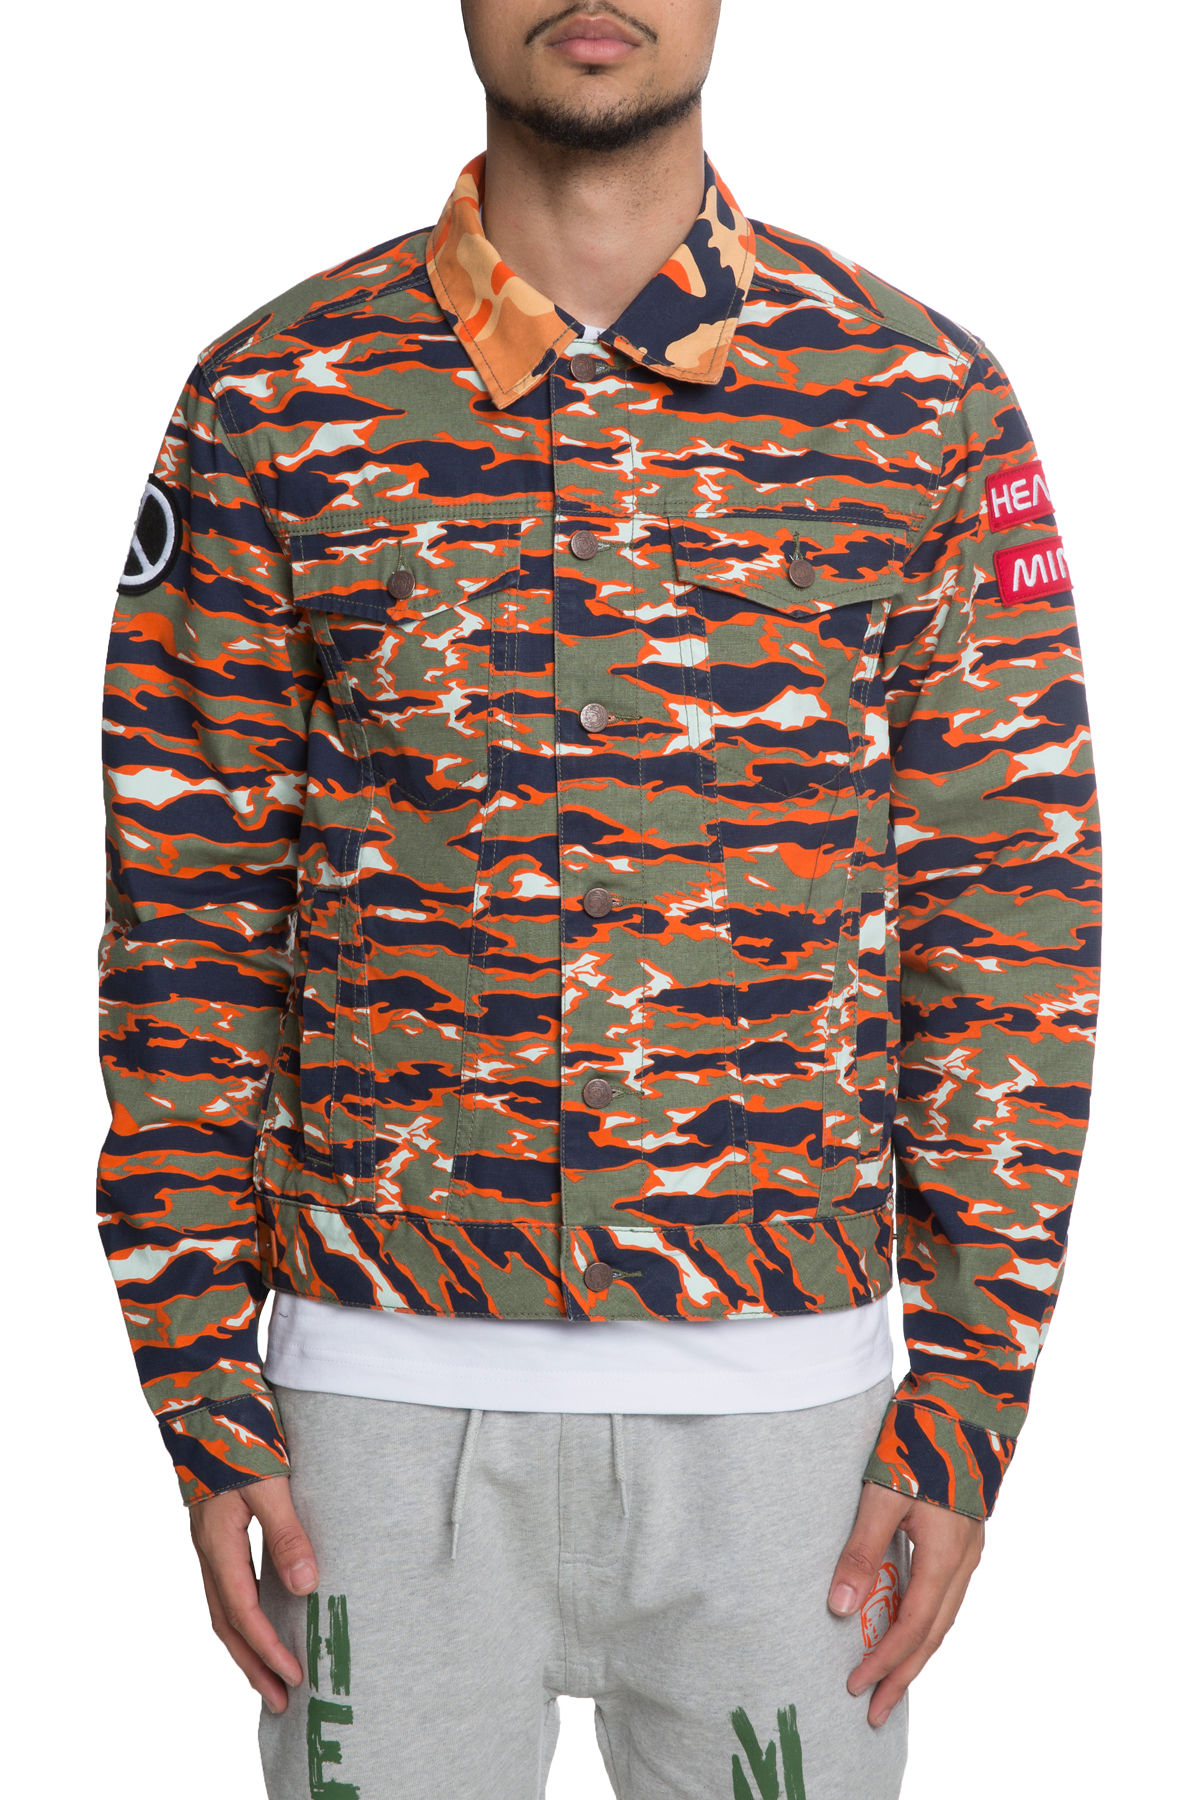 Image of The Commando Jacket in Honey Dew